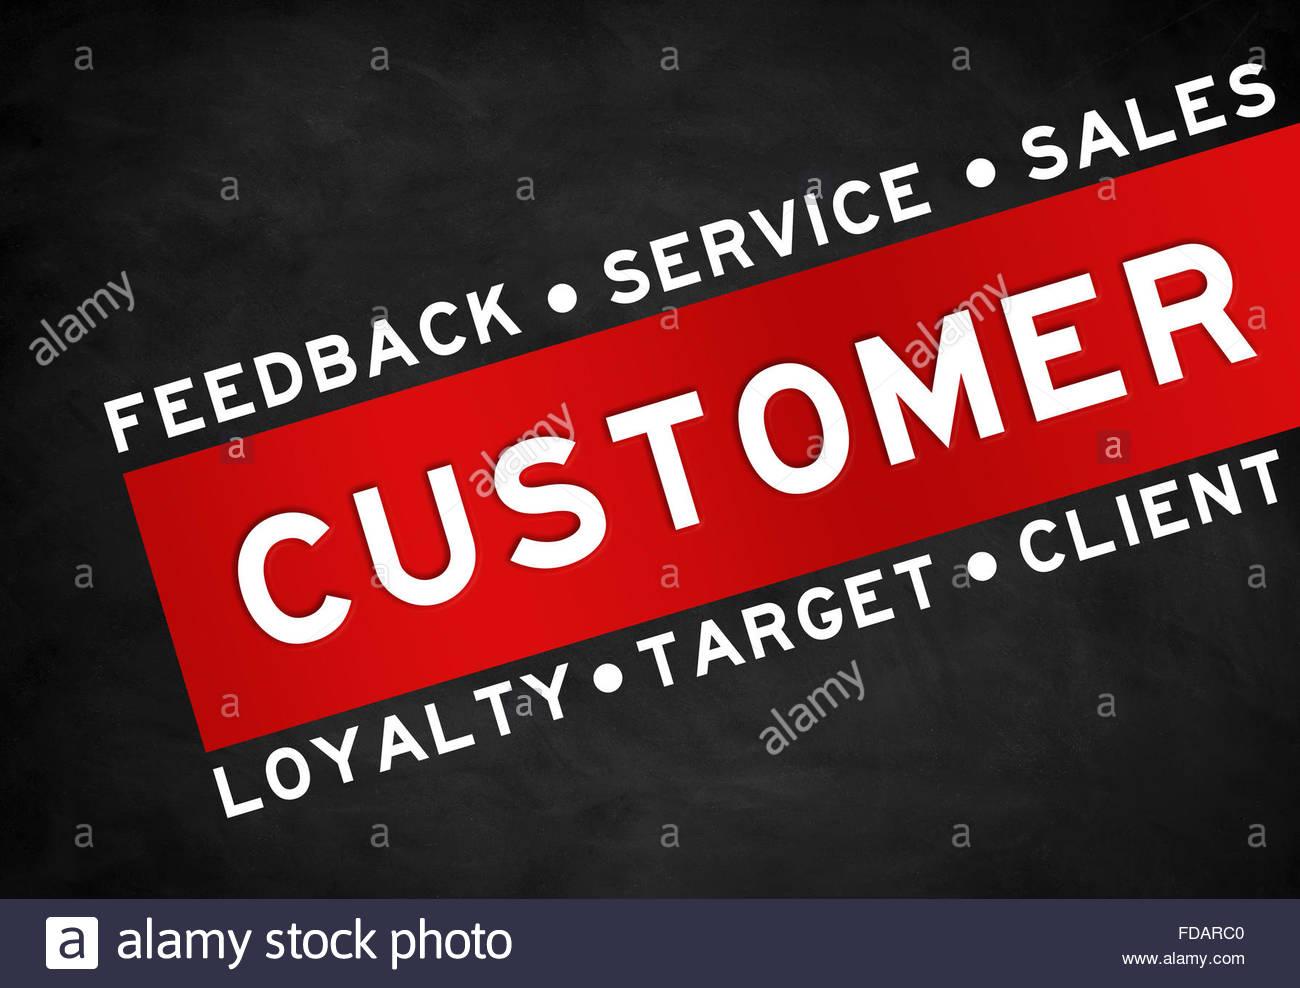 Customer concept advertising - Stock Image